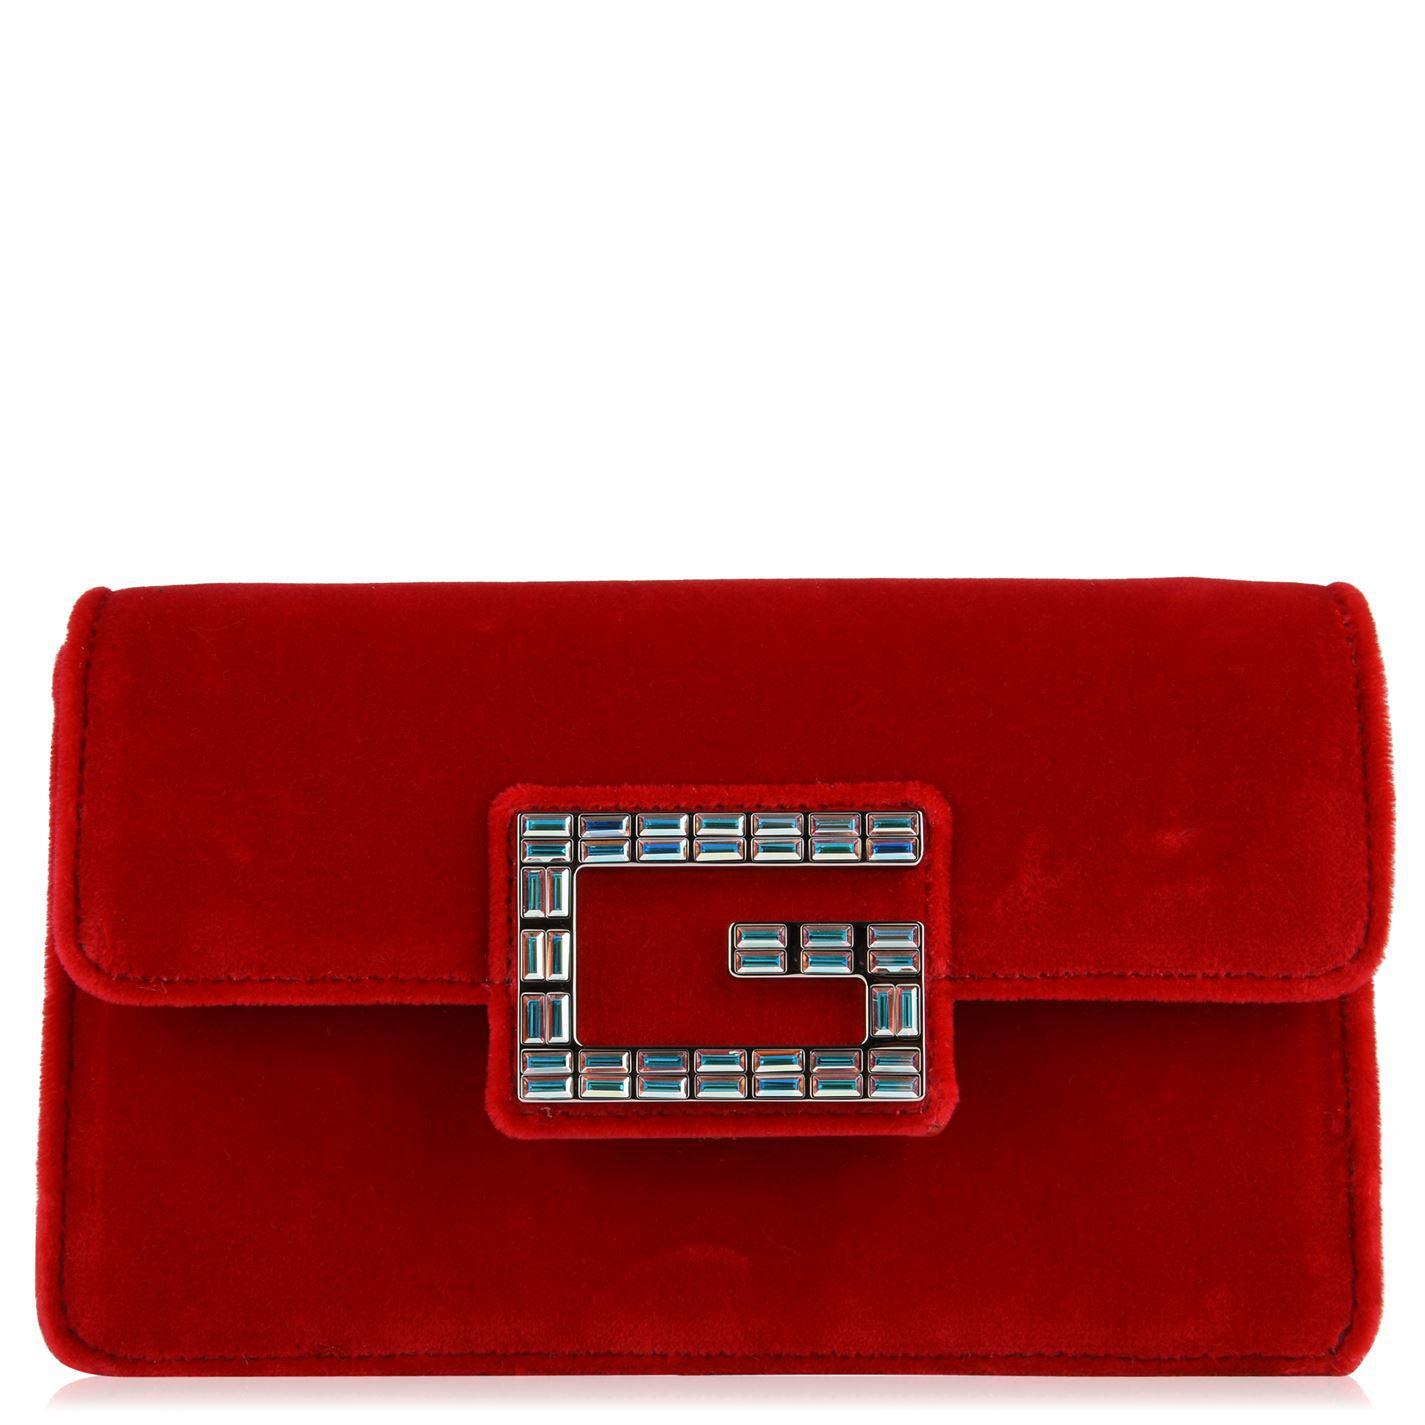 b6408cd8a3d Lyst - Gucci Broadway Velvet Bag in Red